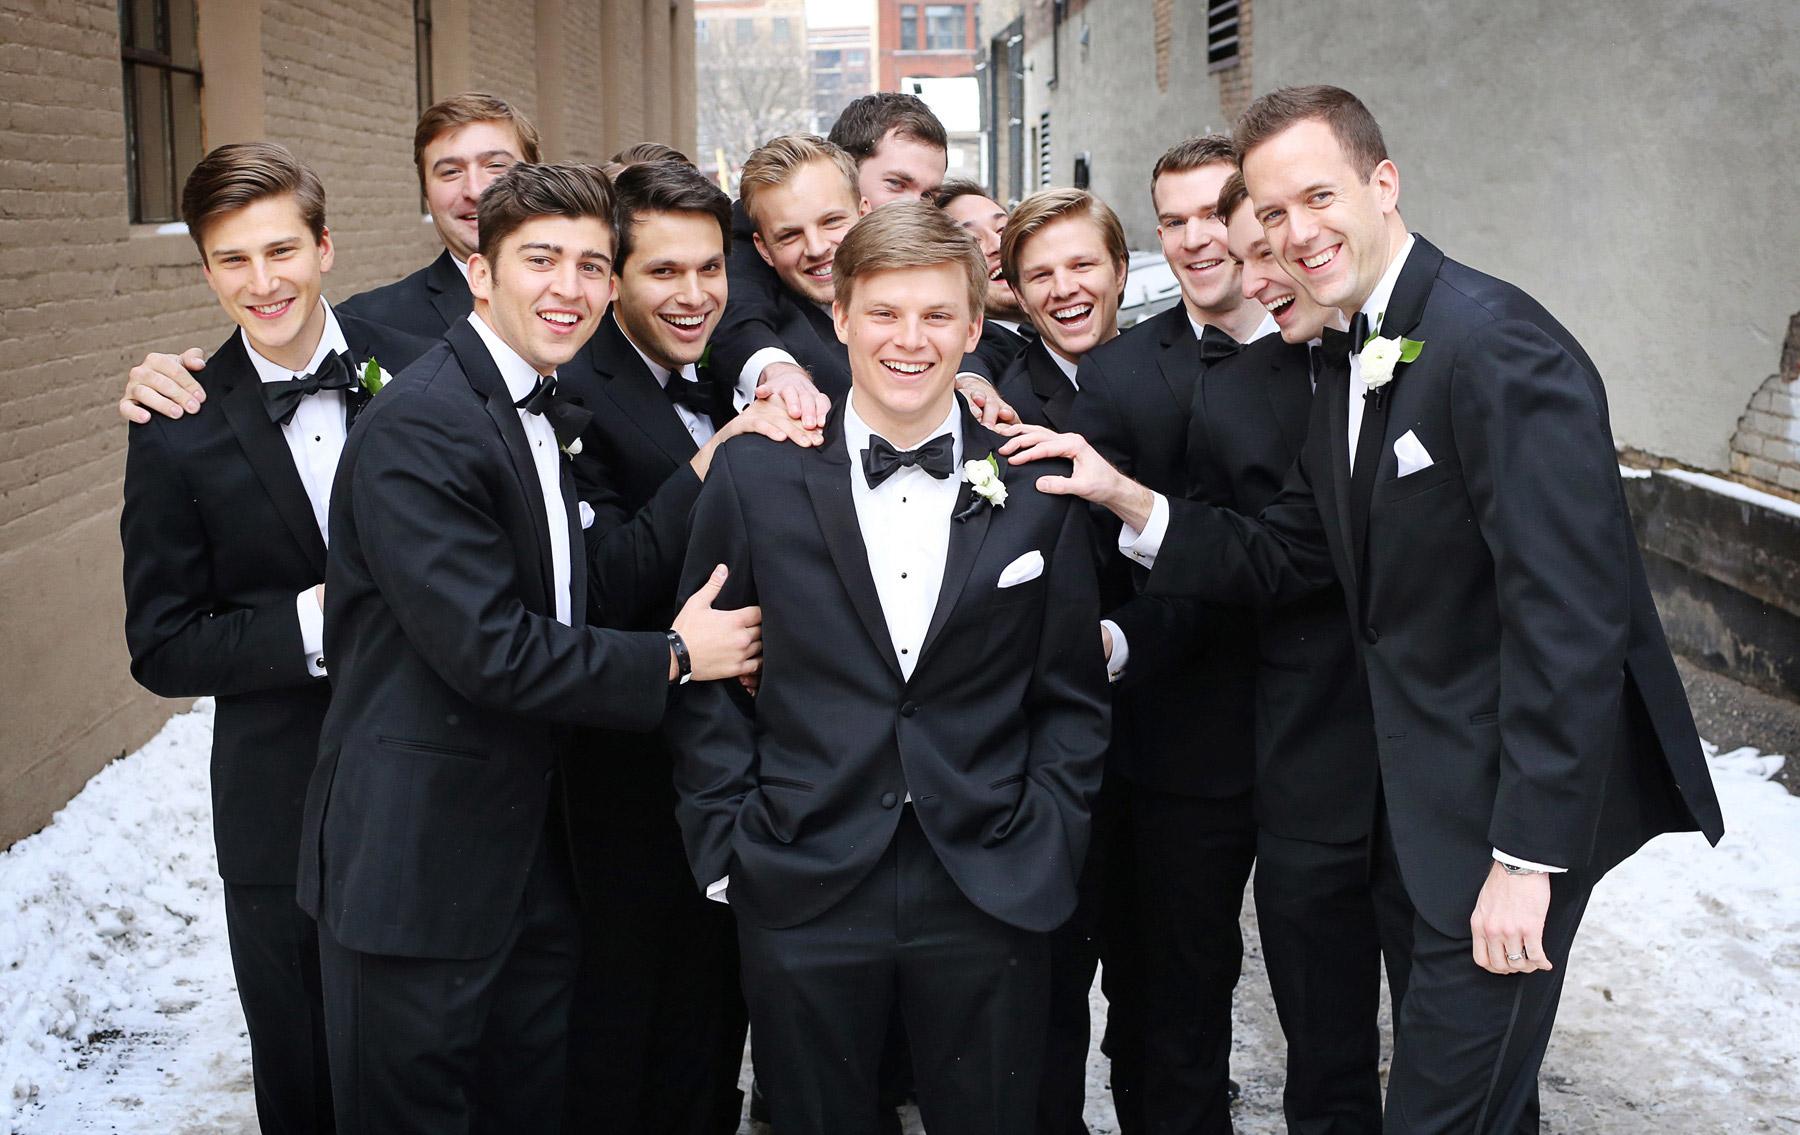 09-Minneapolis-Minnesota-Wedding-Photography-by-Vick-Photography-Downtown-Groomsmen-Winter-Caroline-and-J.jpg